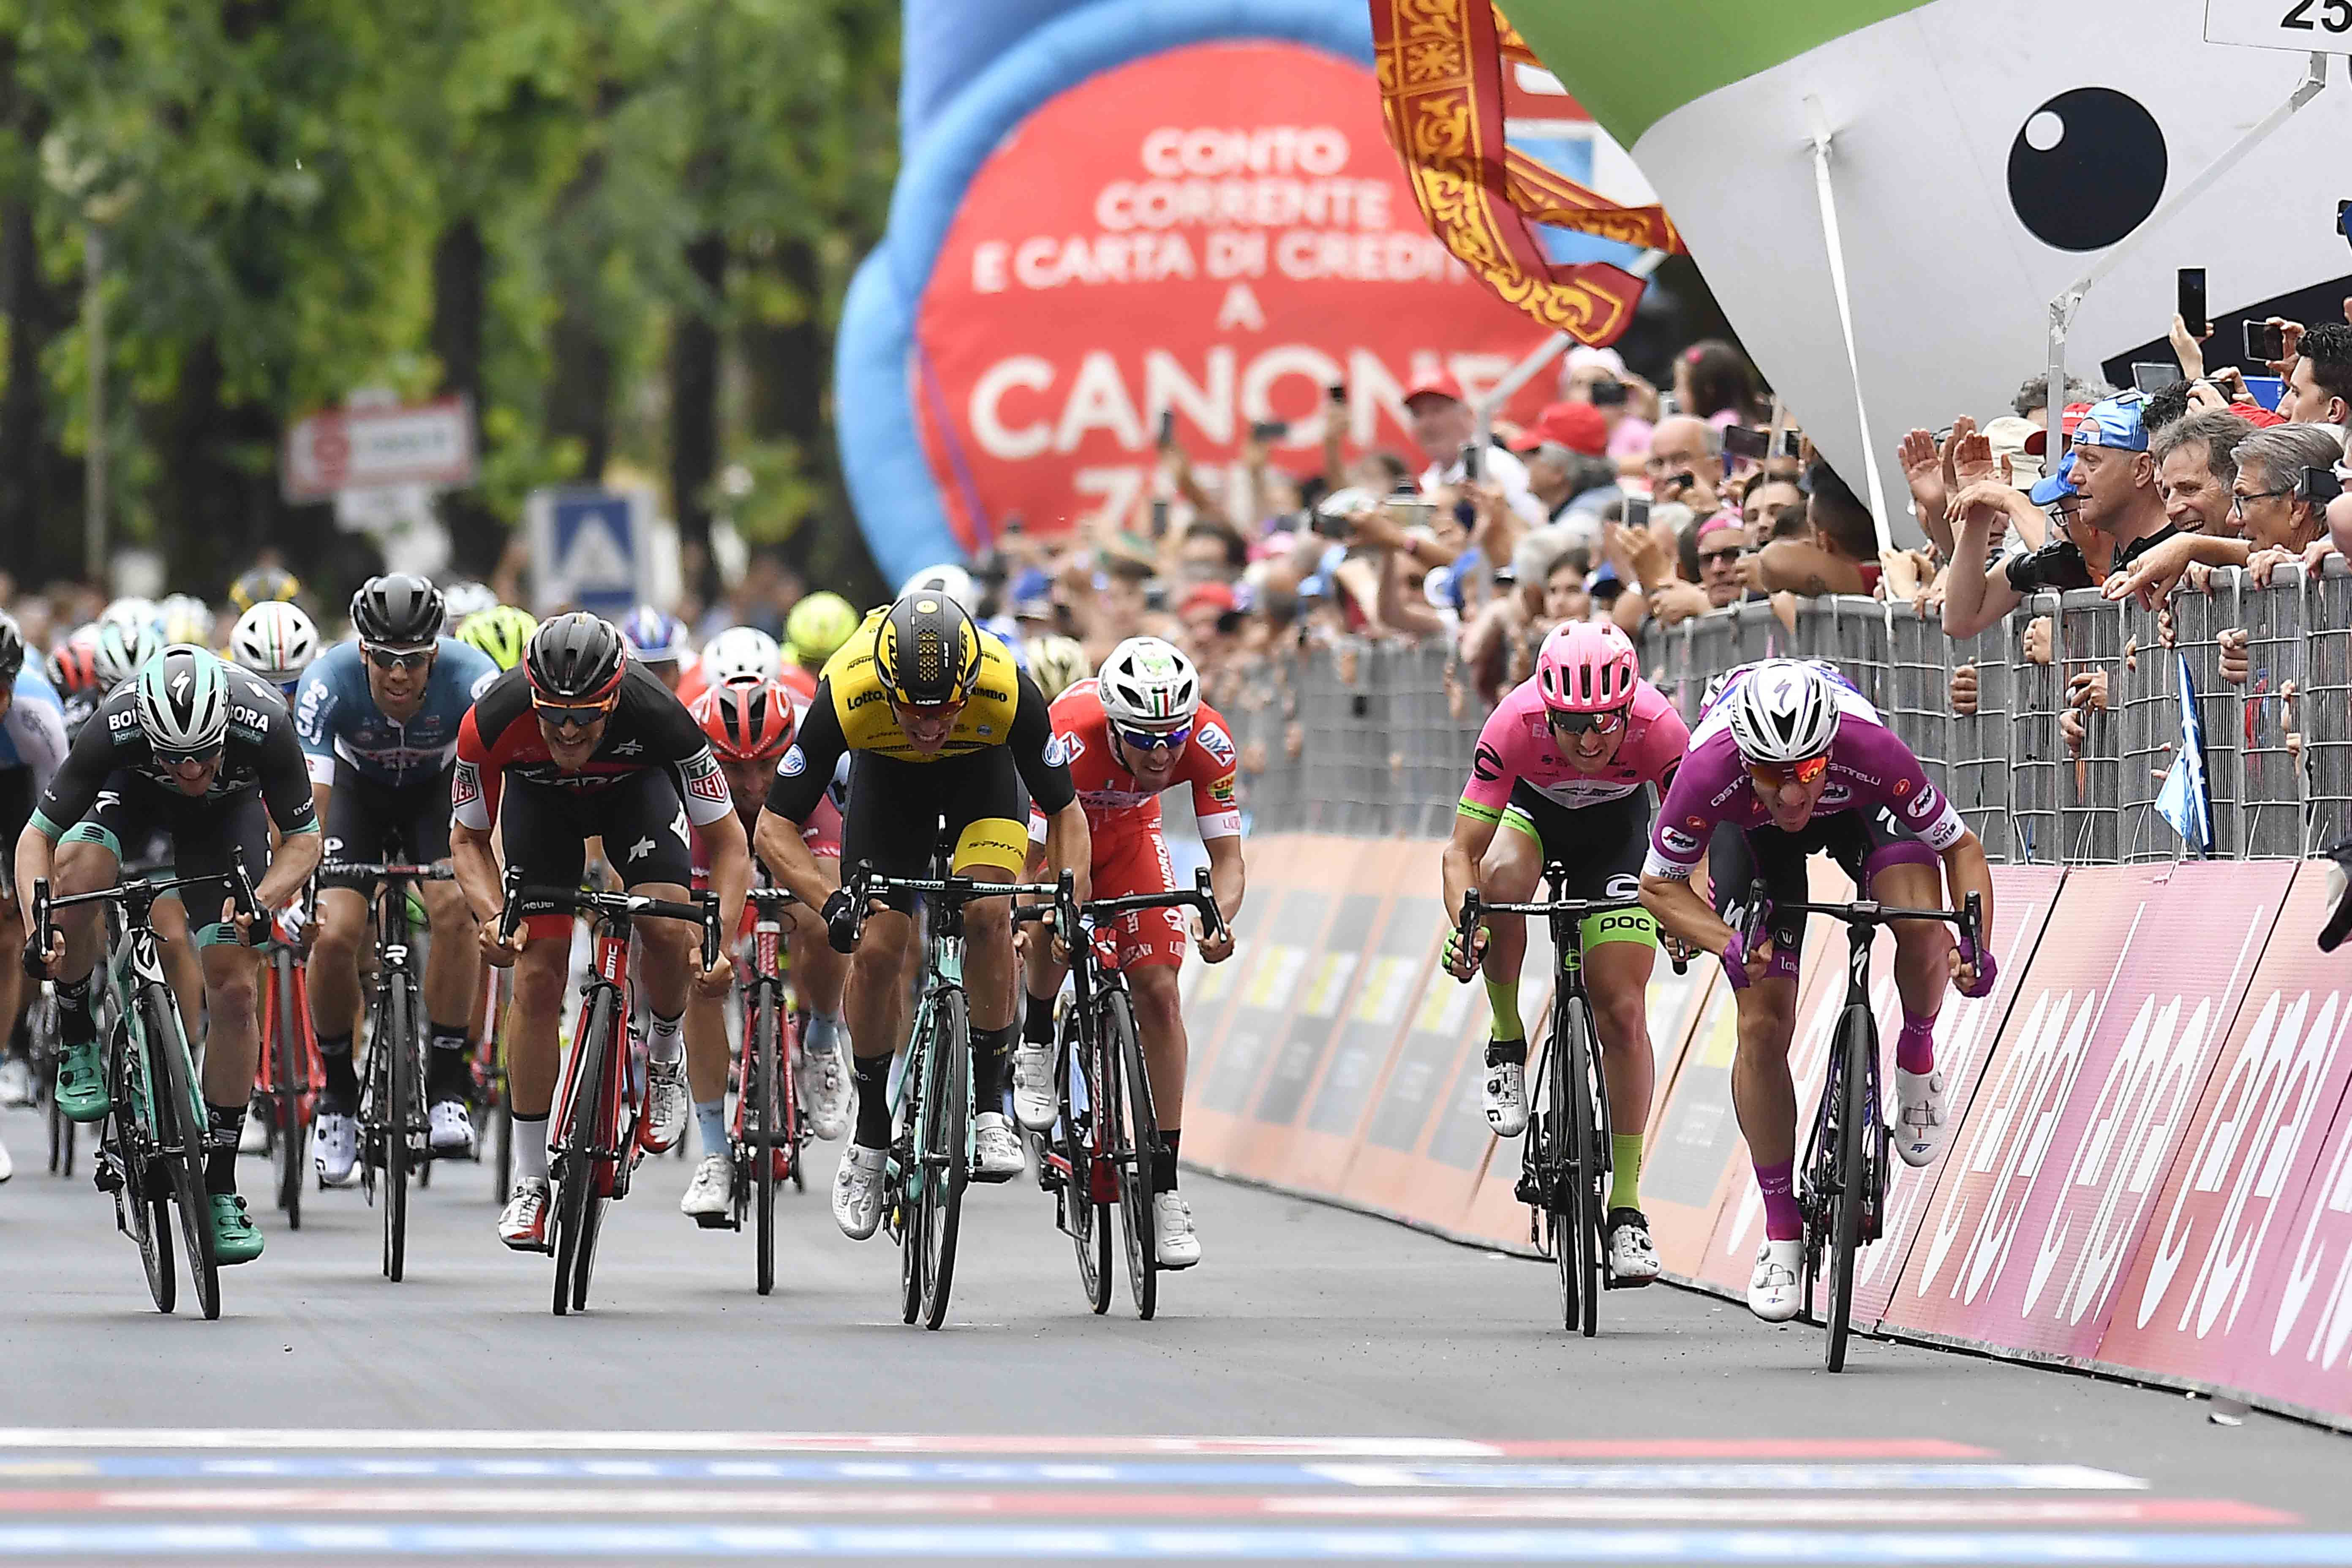 Giro de Italia 2019: listado provisional de participantes